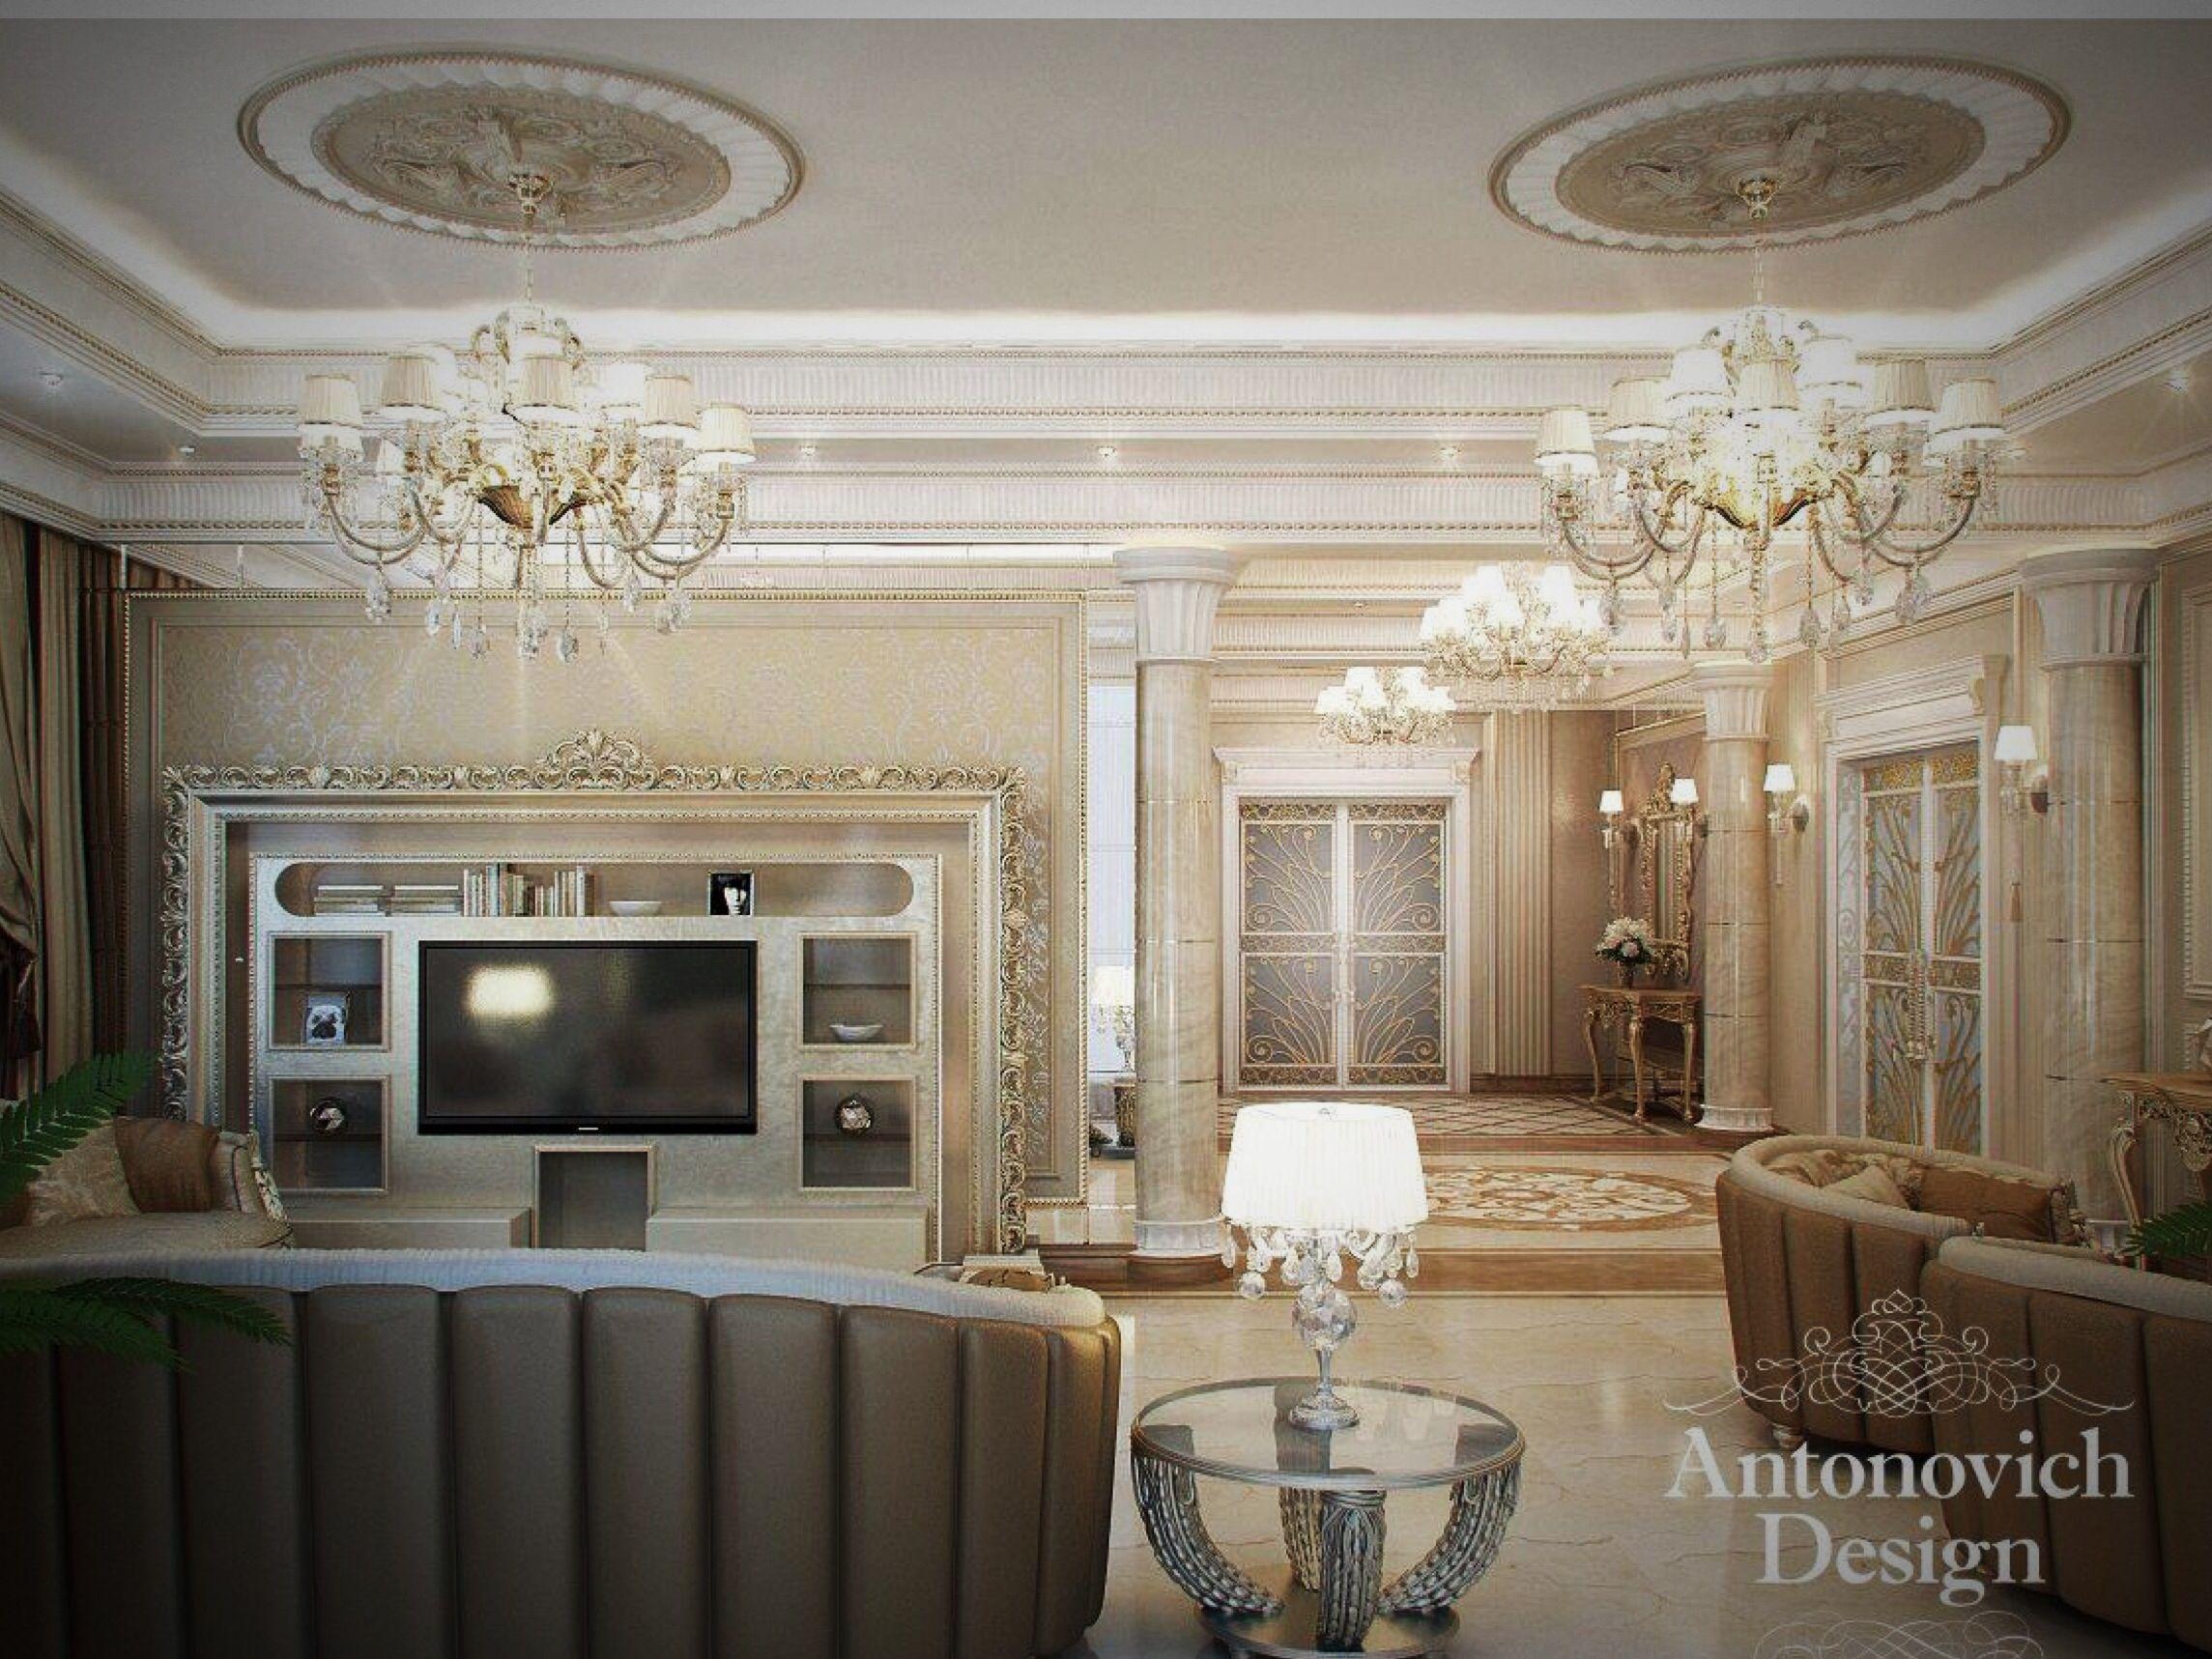 Antonovich design create a Classic and luxury home living ...